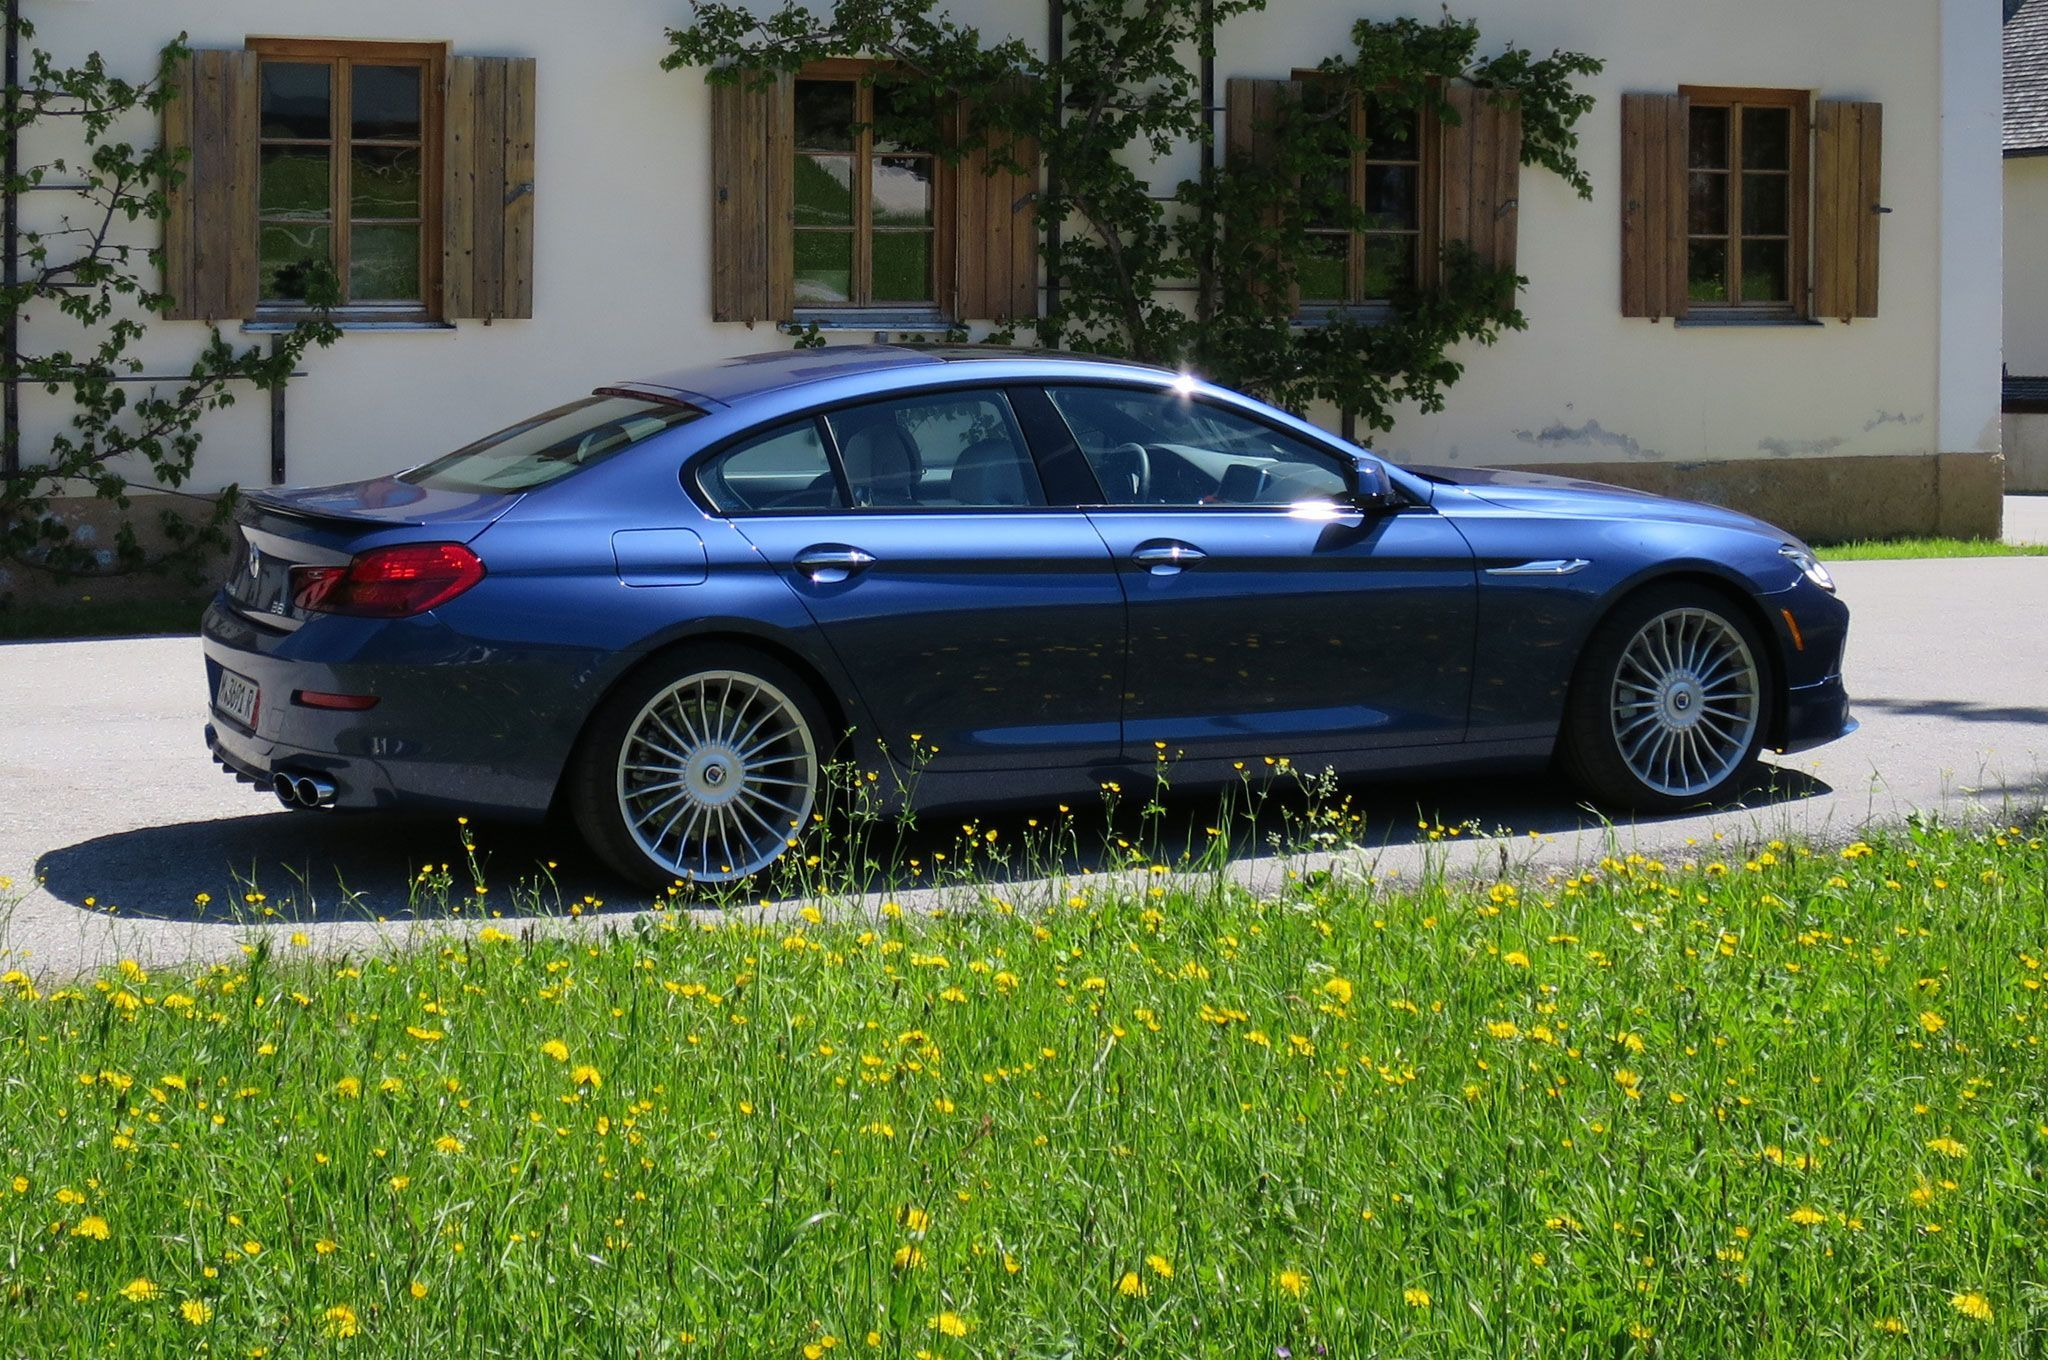 BMW Alpina B Gran Coupe Schwartzerdesscode Pinterest BMW - Bmw alpina b6